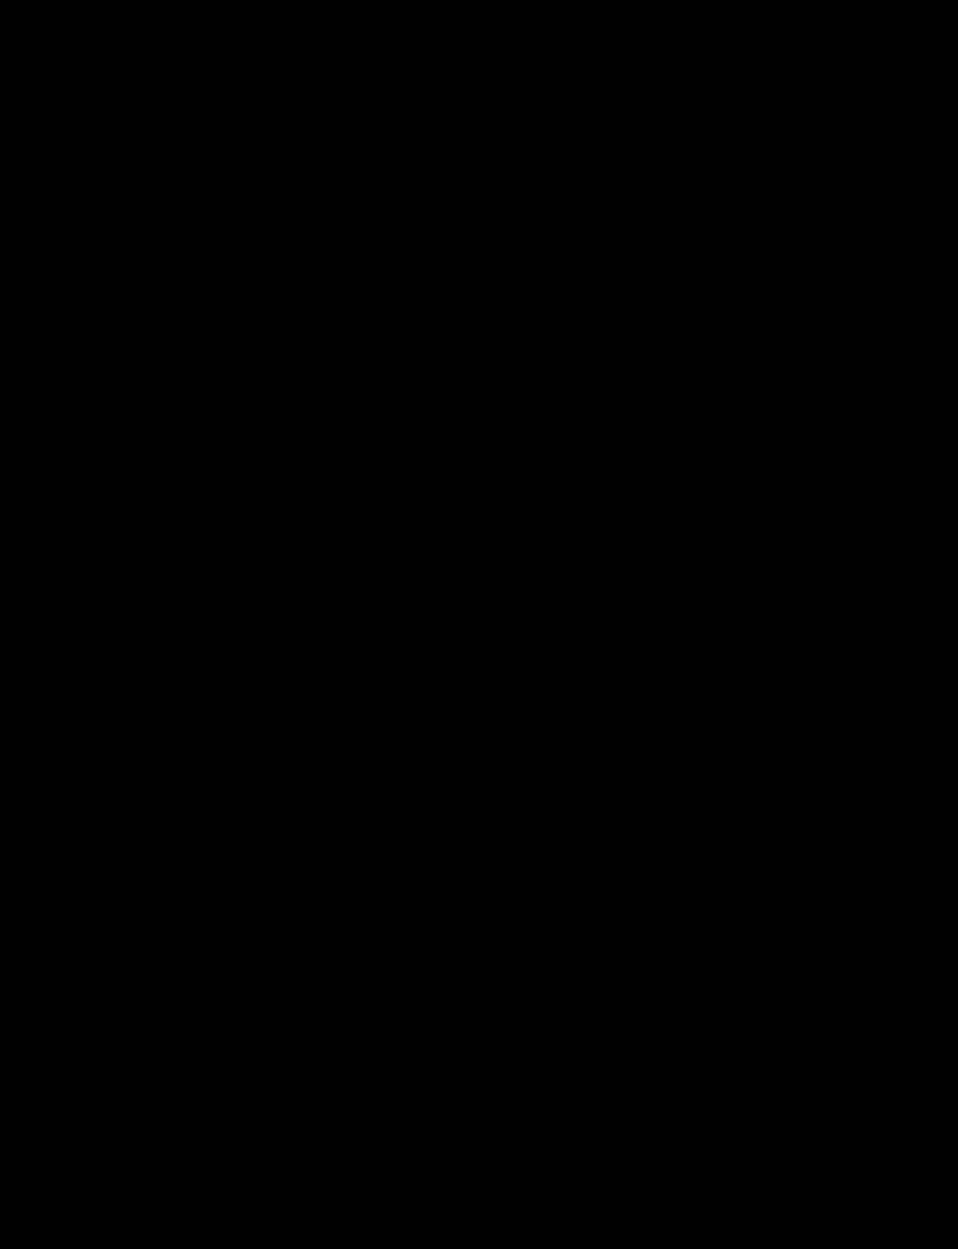 DB9-Male